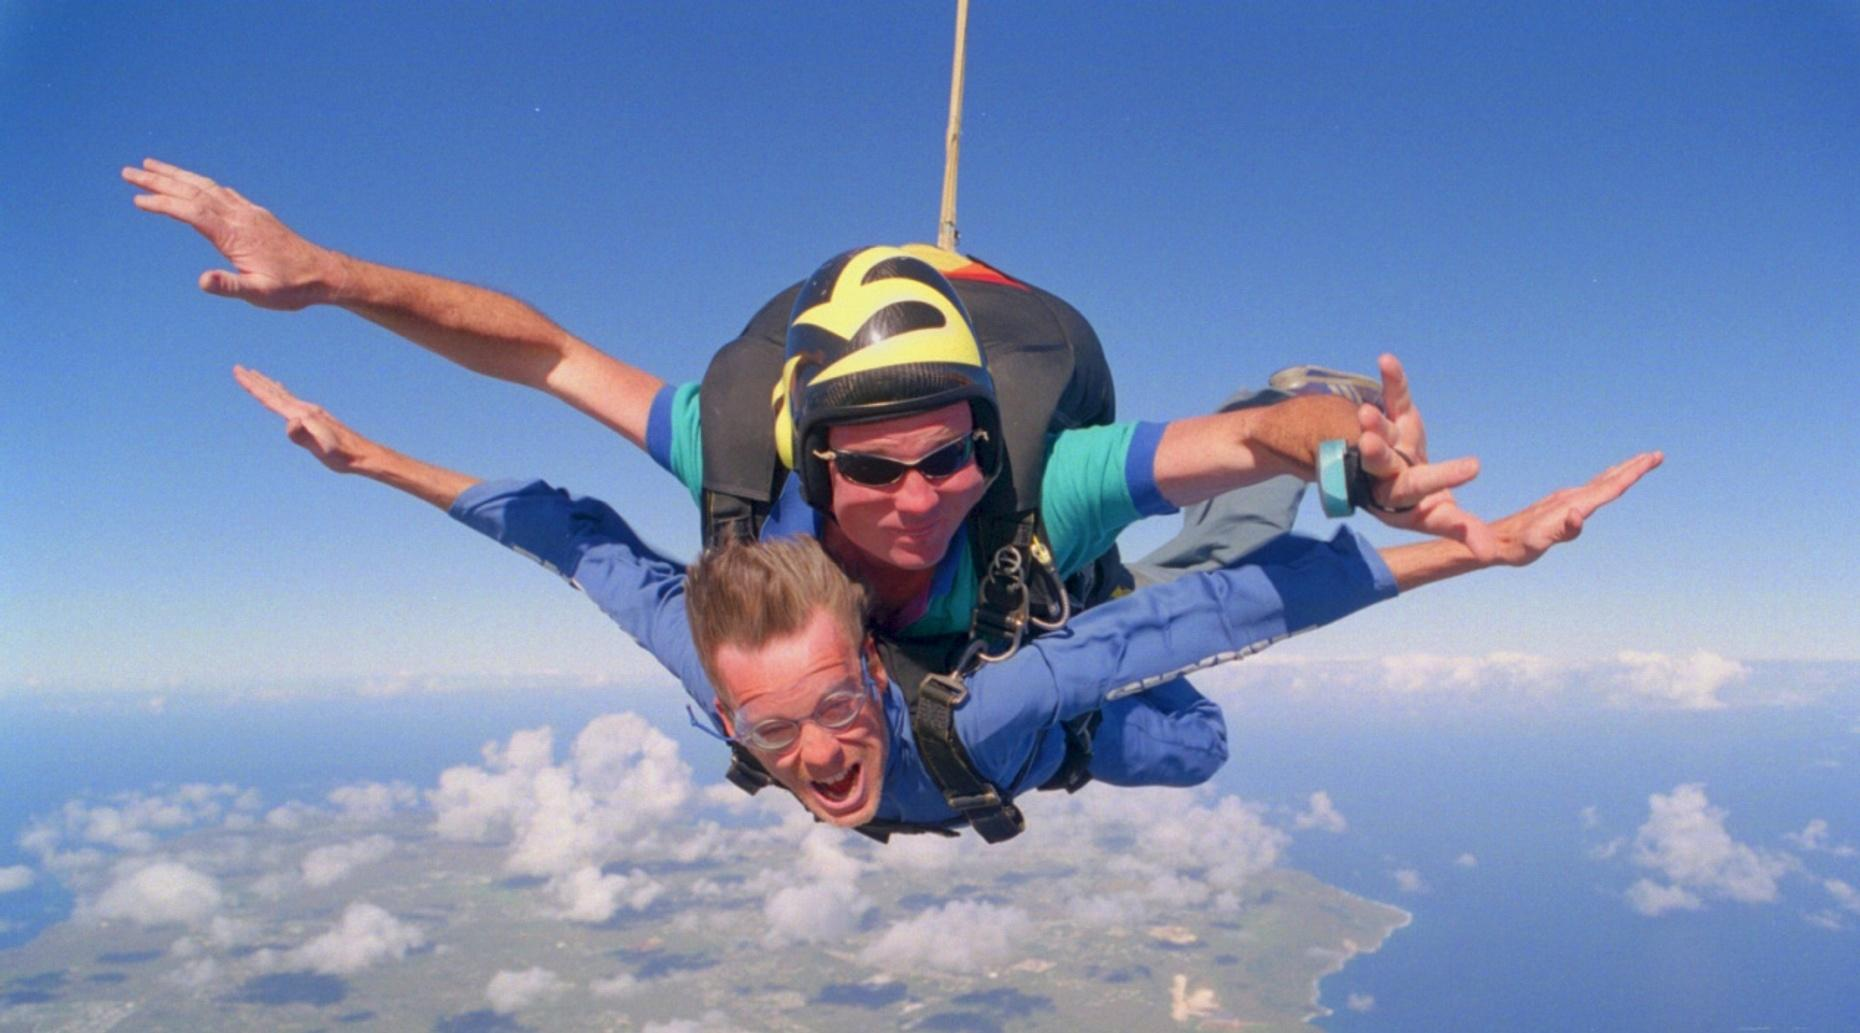 Tandem Skydive Adventure in Shelton